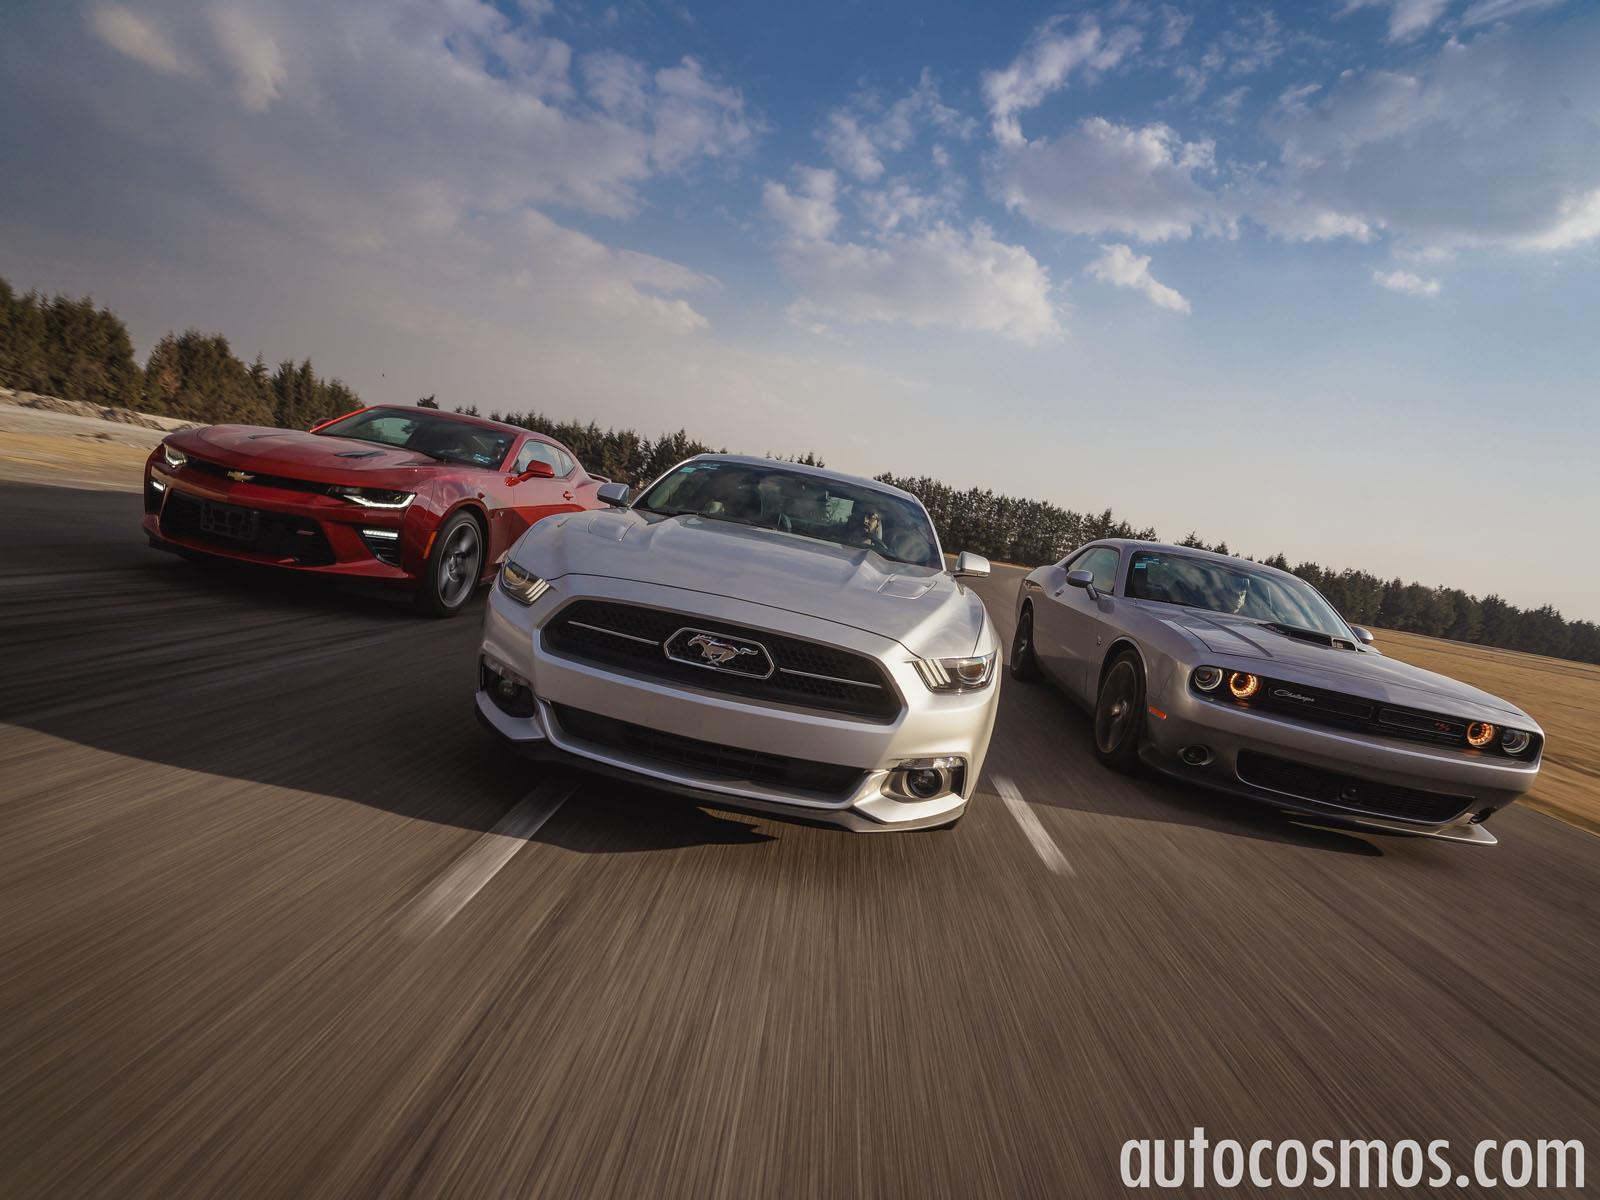 Challenger Vs Mustang >> Prueba de manejo: Ford Mustang vs Chevrolet Camaro vs Dodge Challenger - Autocosmos.com